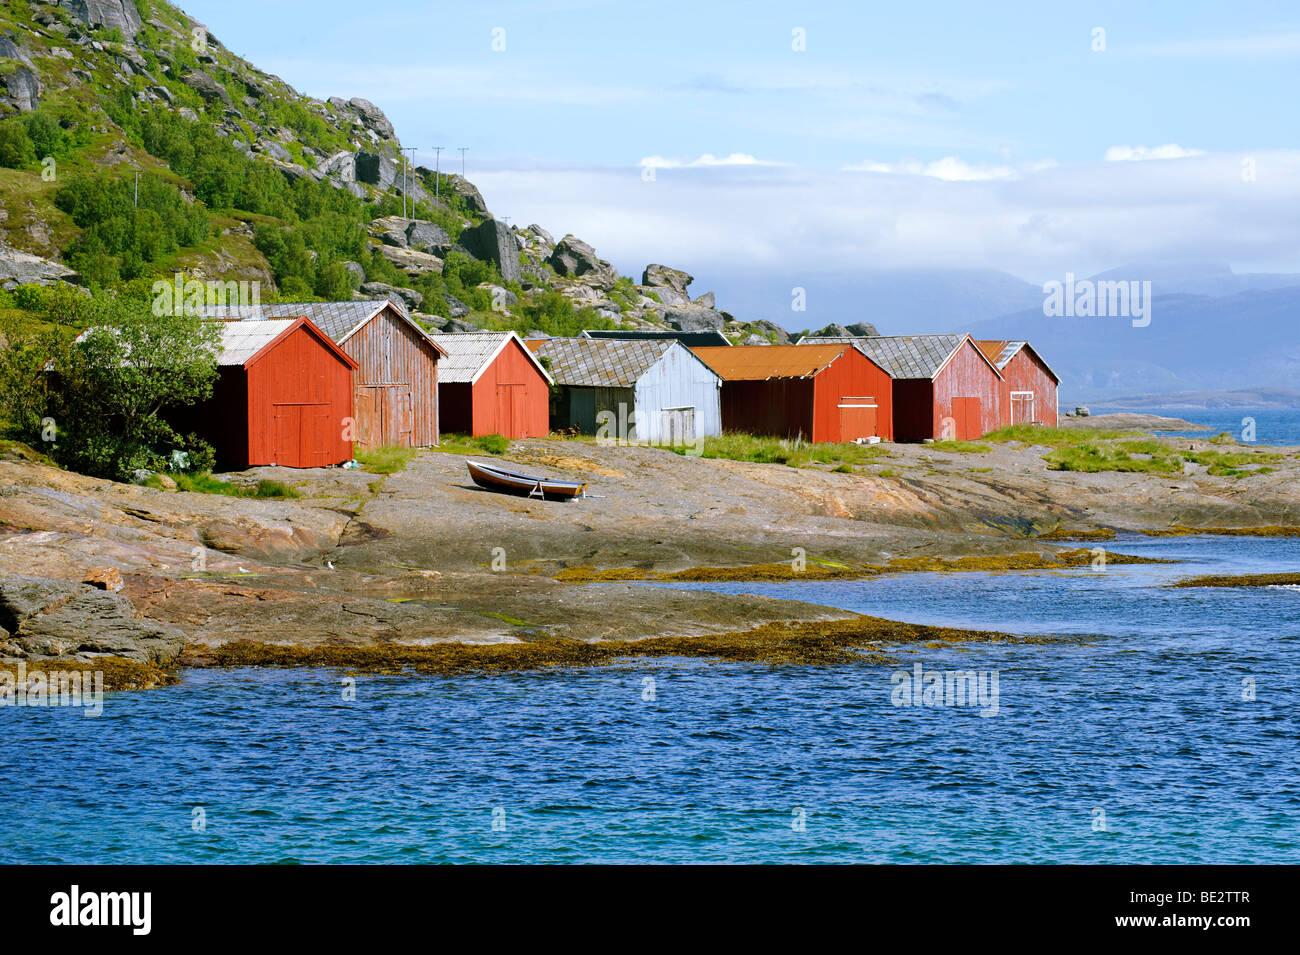 Houses at the Holandfjord, Norway, Scandinavia, Europe - Stock Image